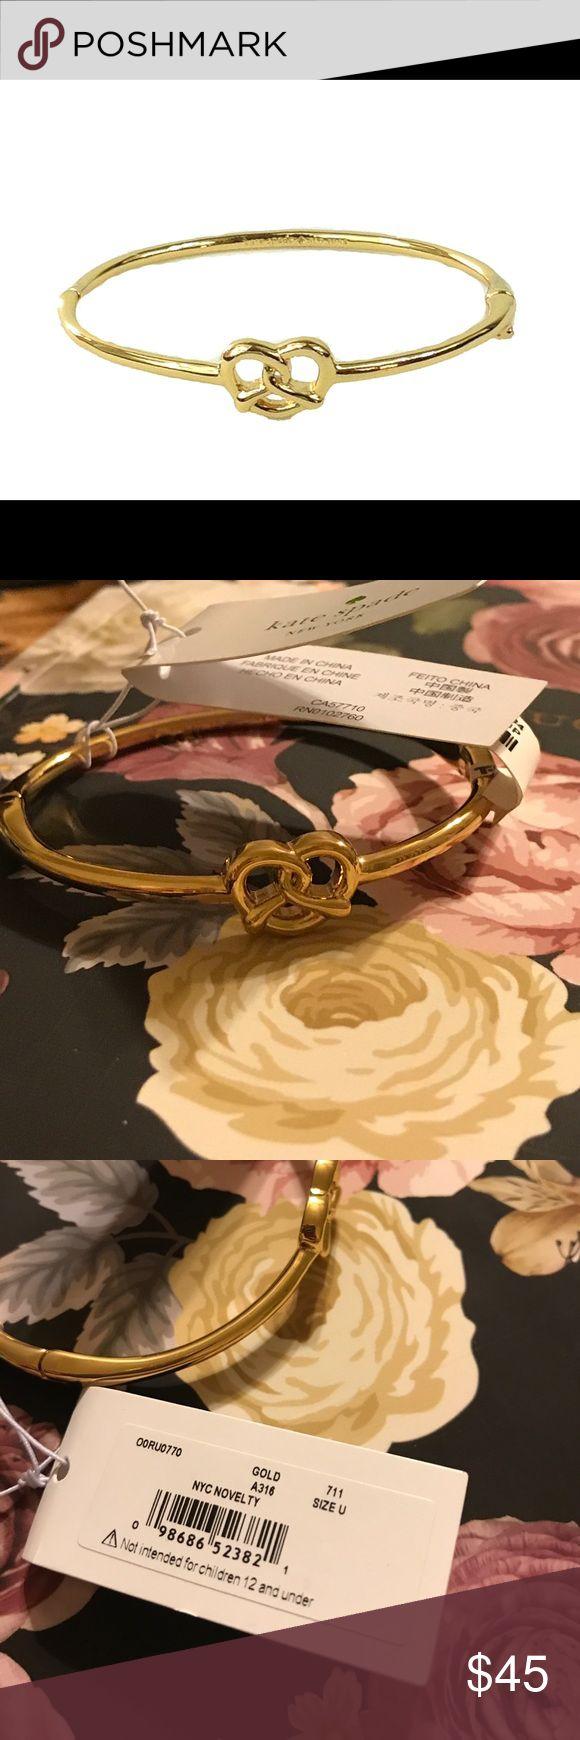 Kate Spade pretzel bangle So fun! Brand new with tags! kate spade Jewelry Bracelets